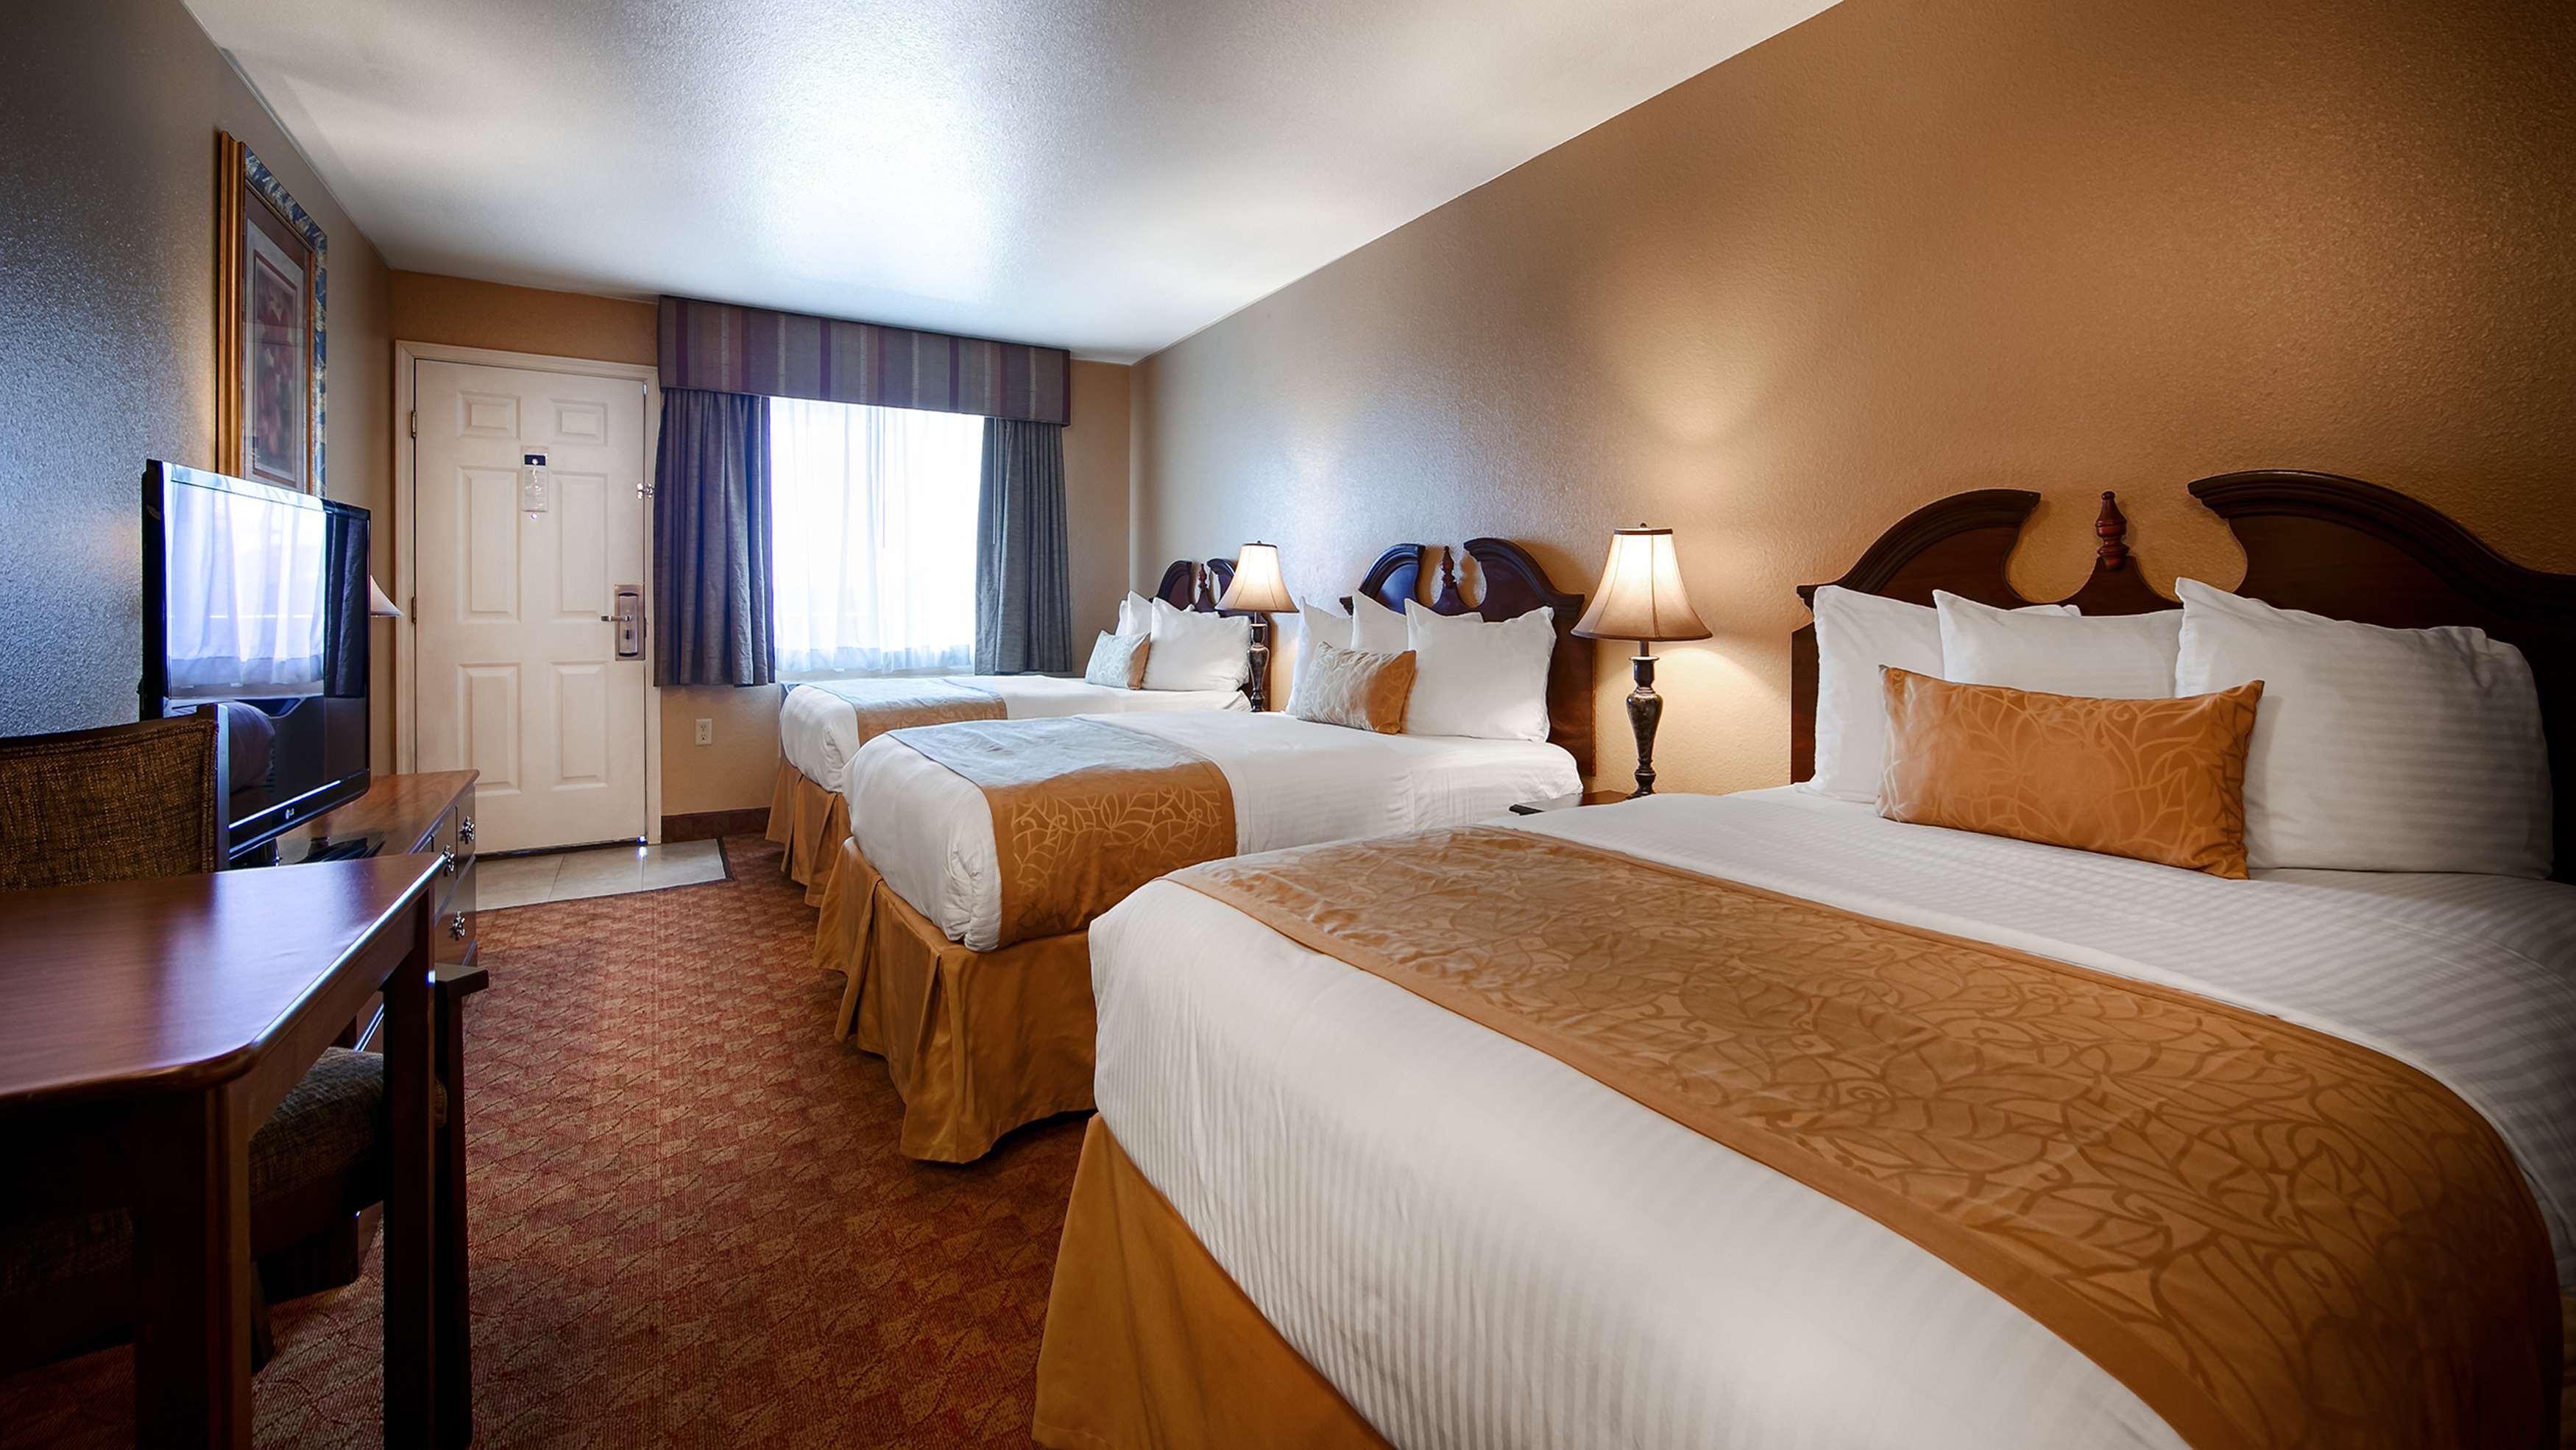 Best Western Fallon Inn & Suites image 12